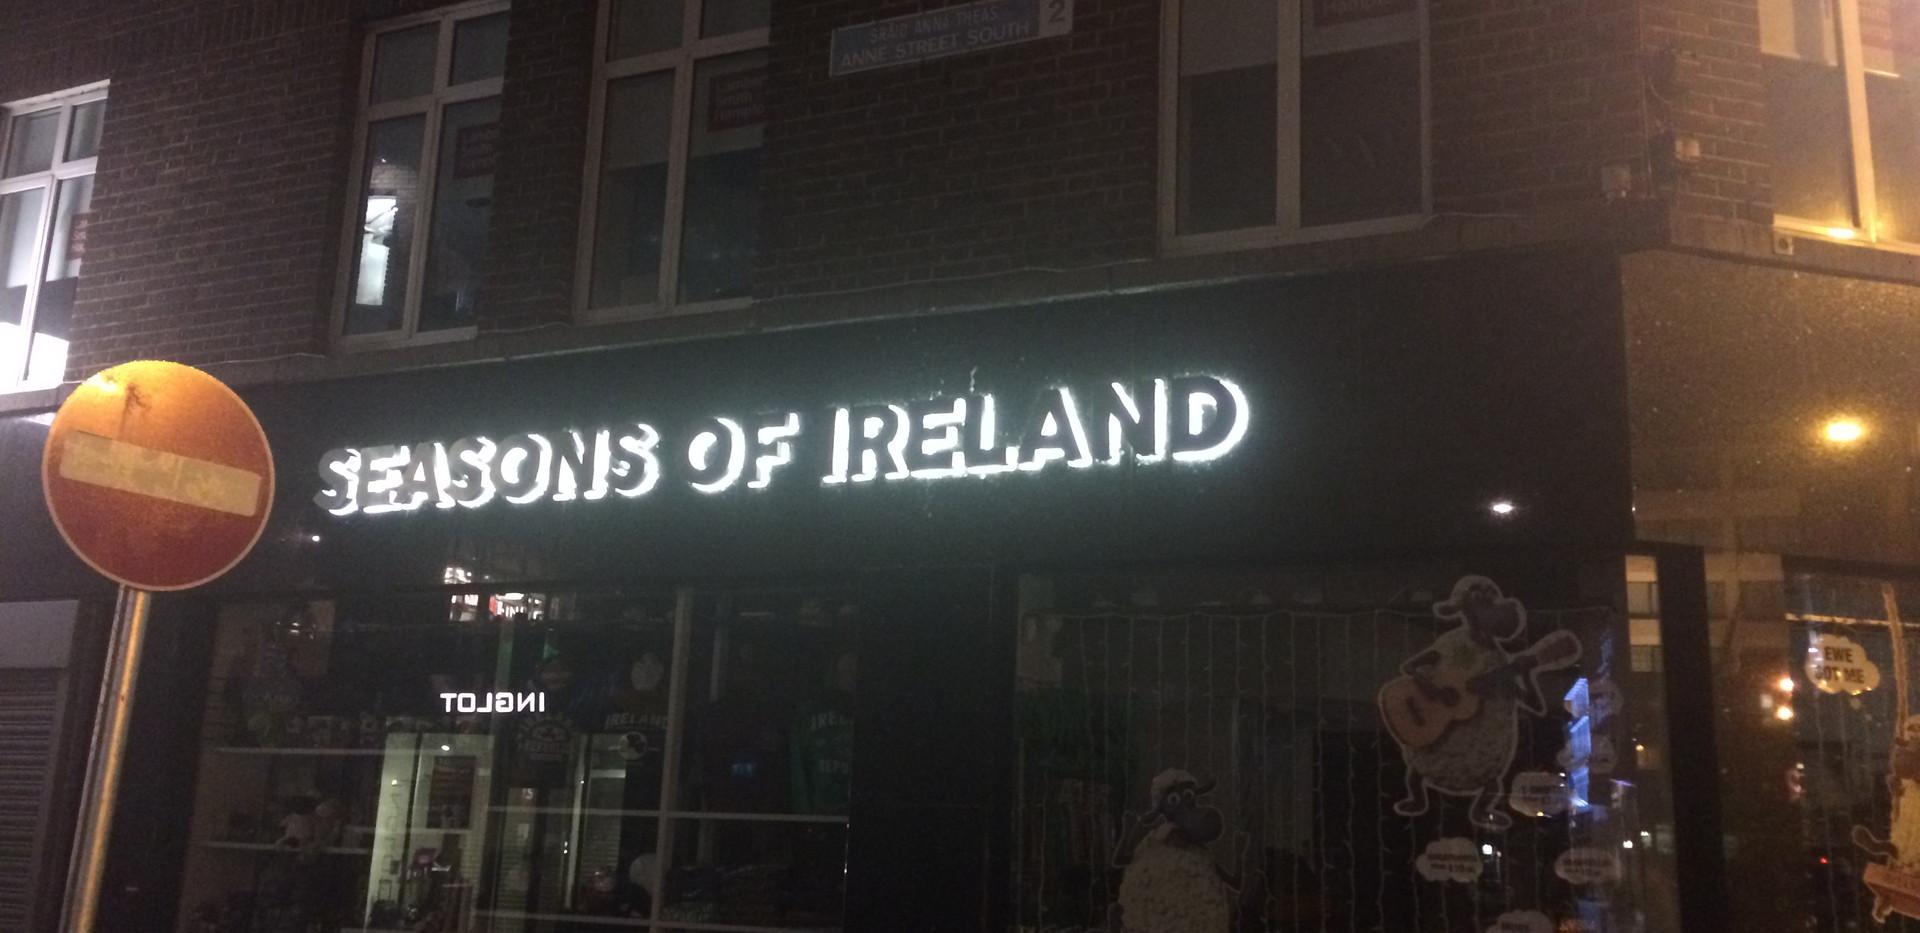 Seasons of Ireland